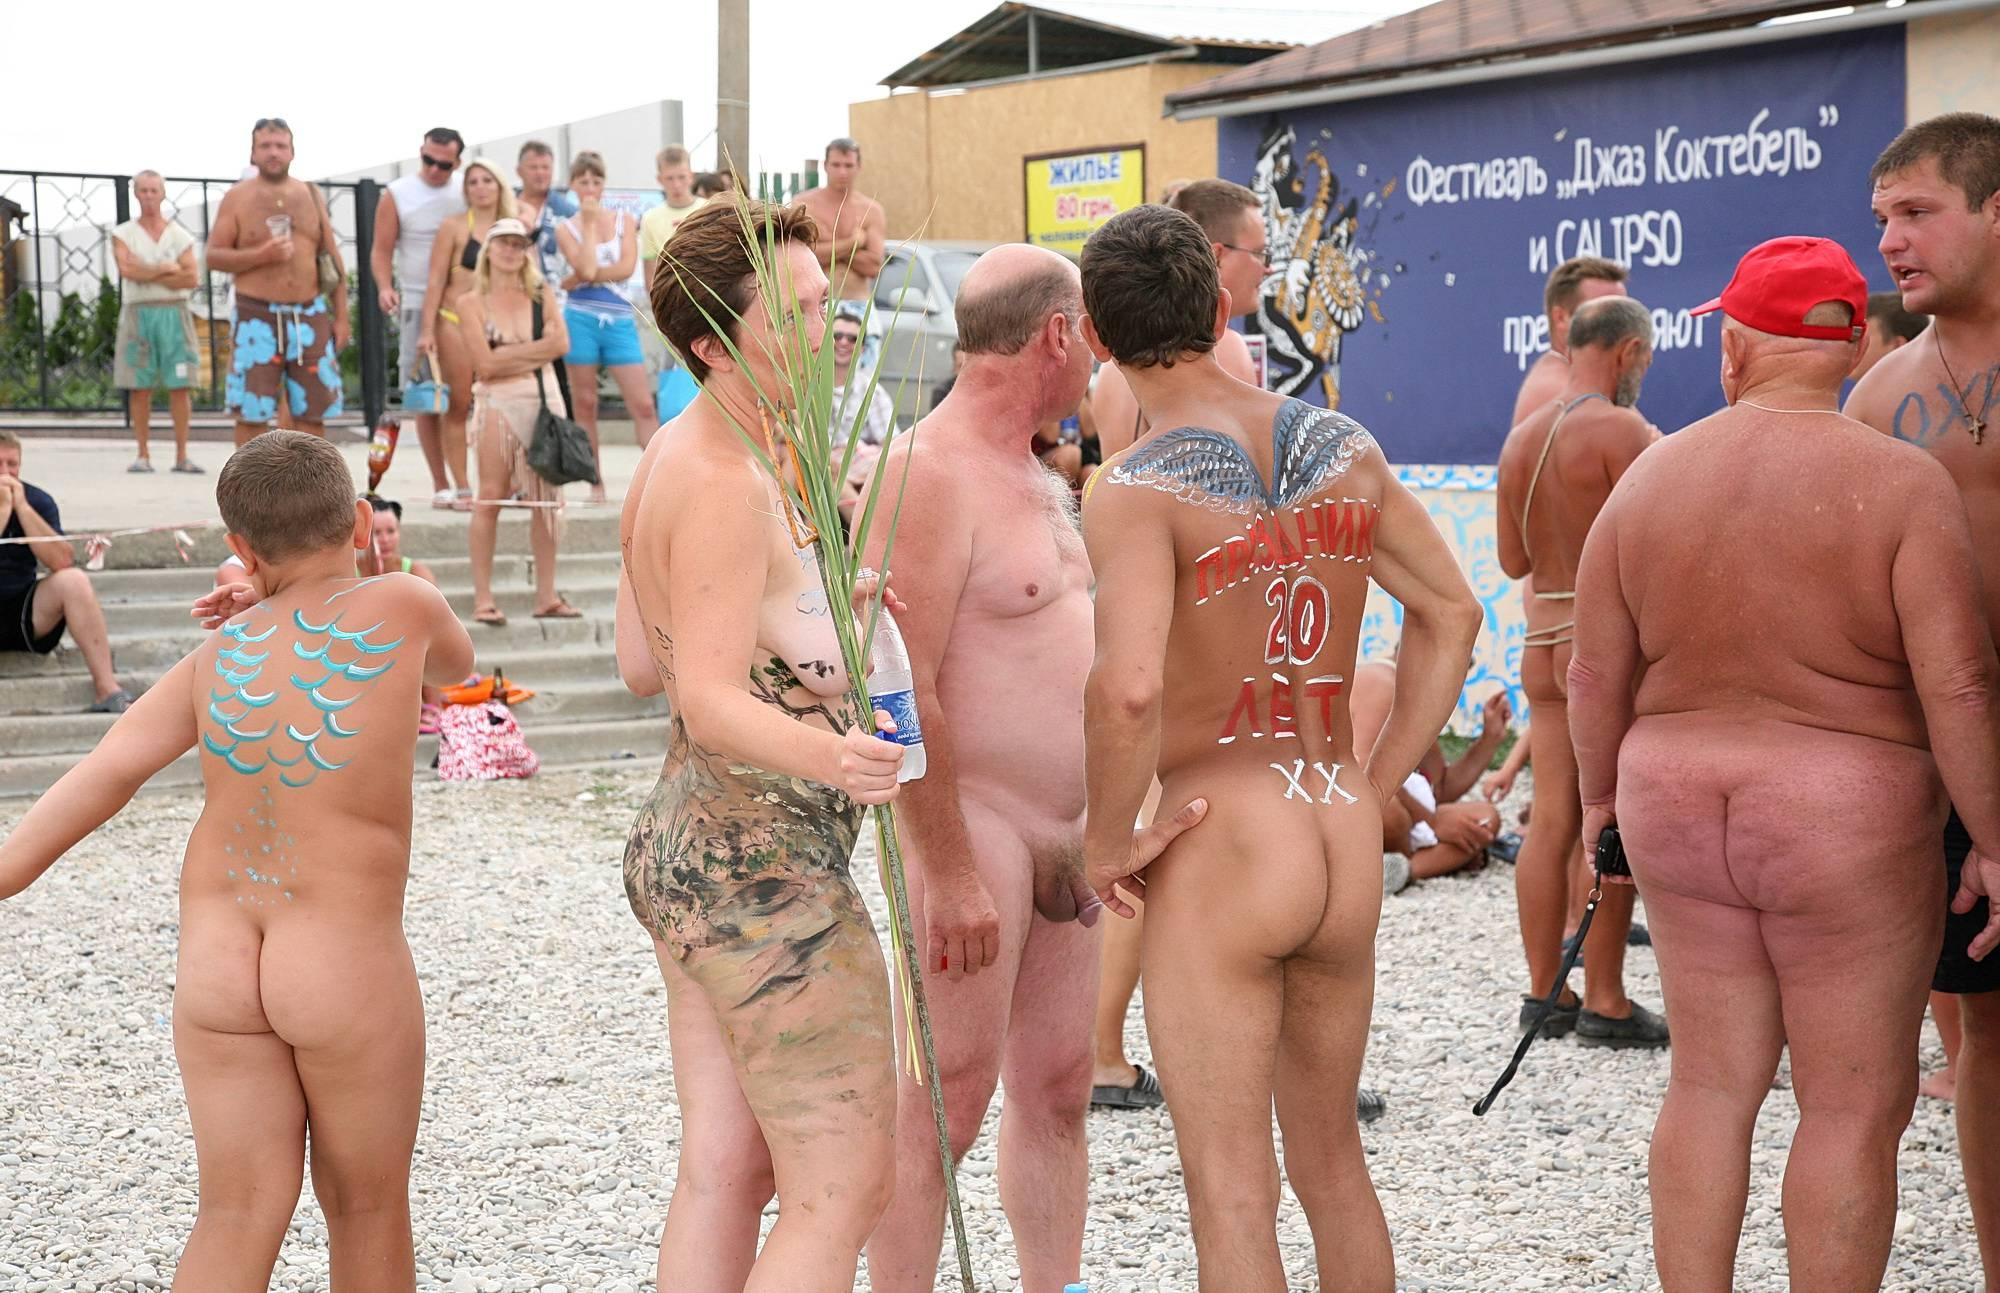 Nudist Gallery Outdoor Beach Party - 2